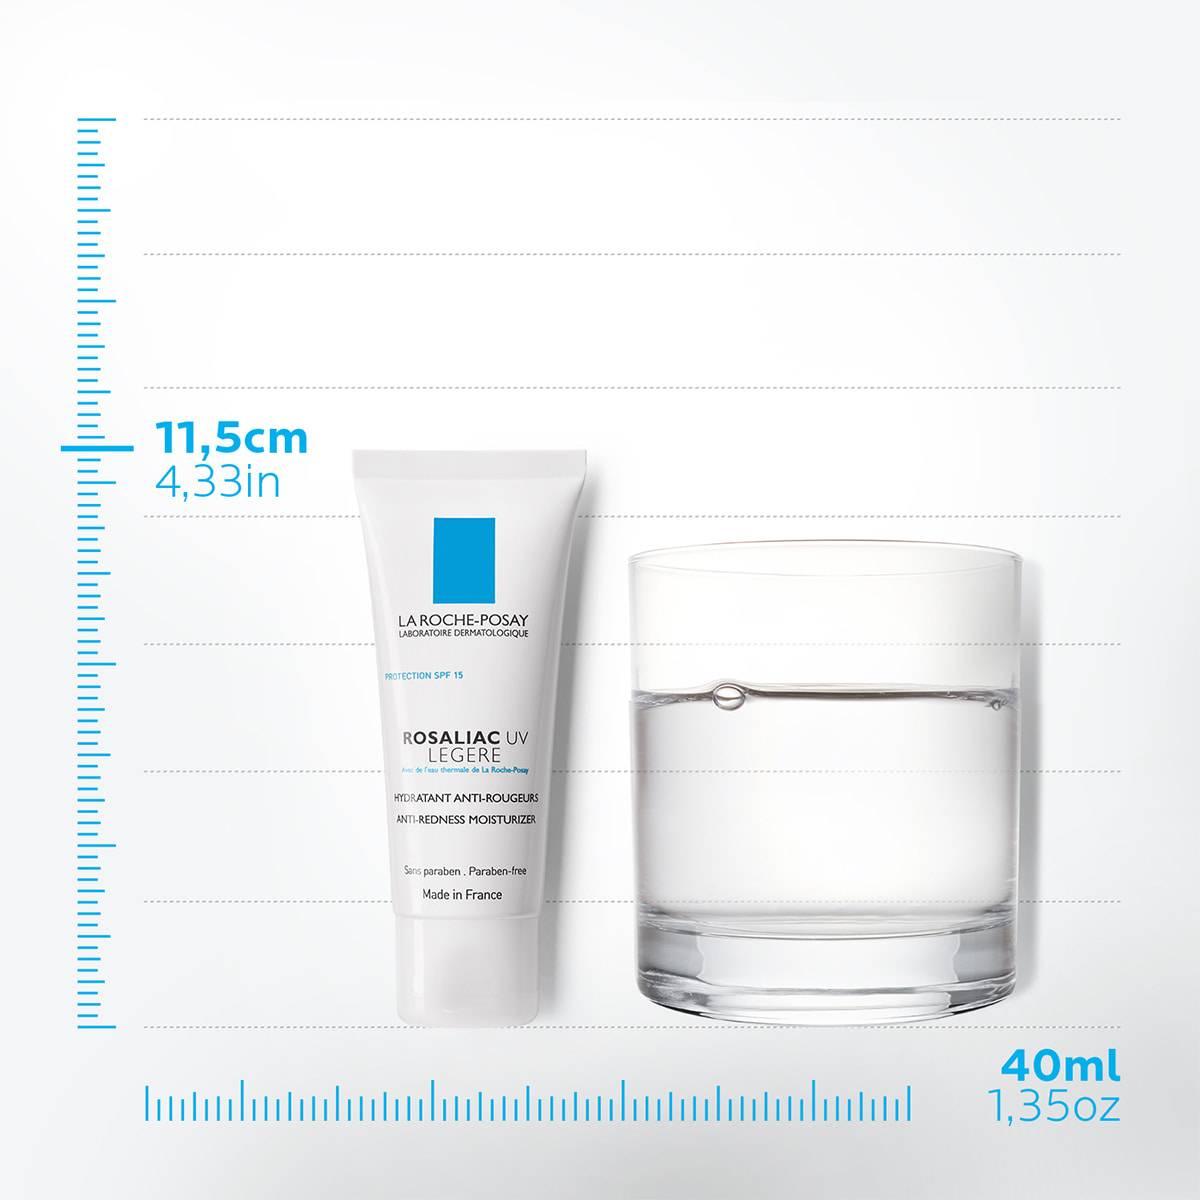 La Roche Posay ProduktSide Ansiktspleie Rosaliac UV Light Spf15 40ml 3337